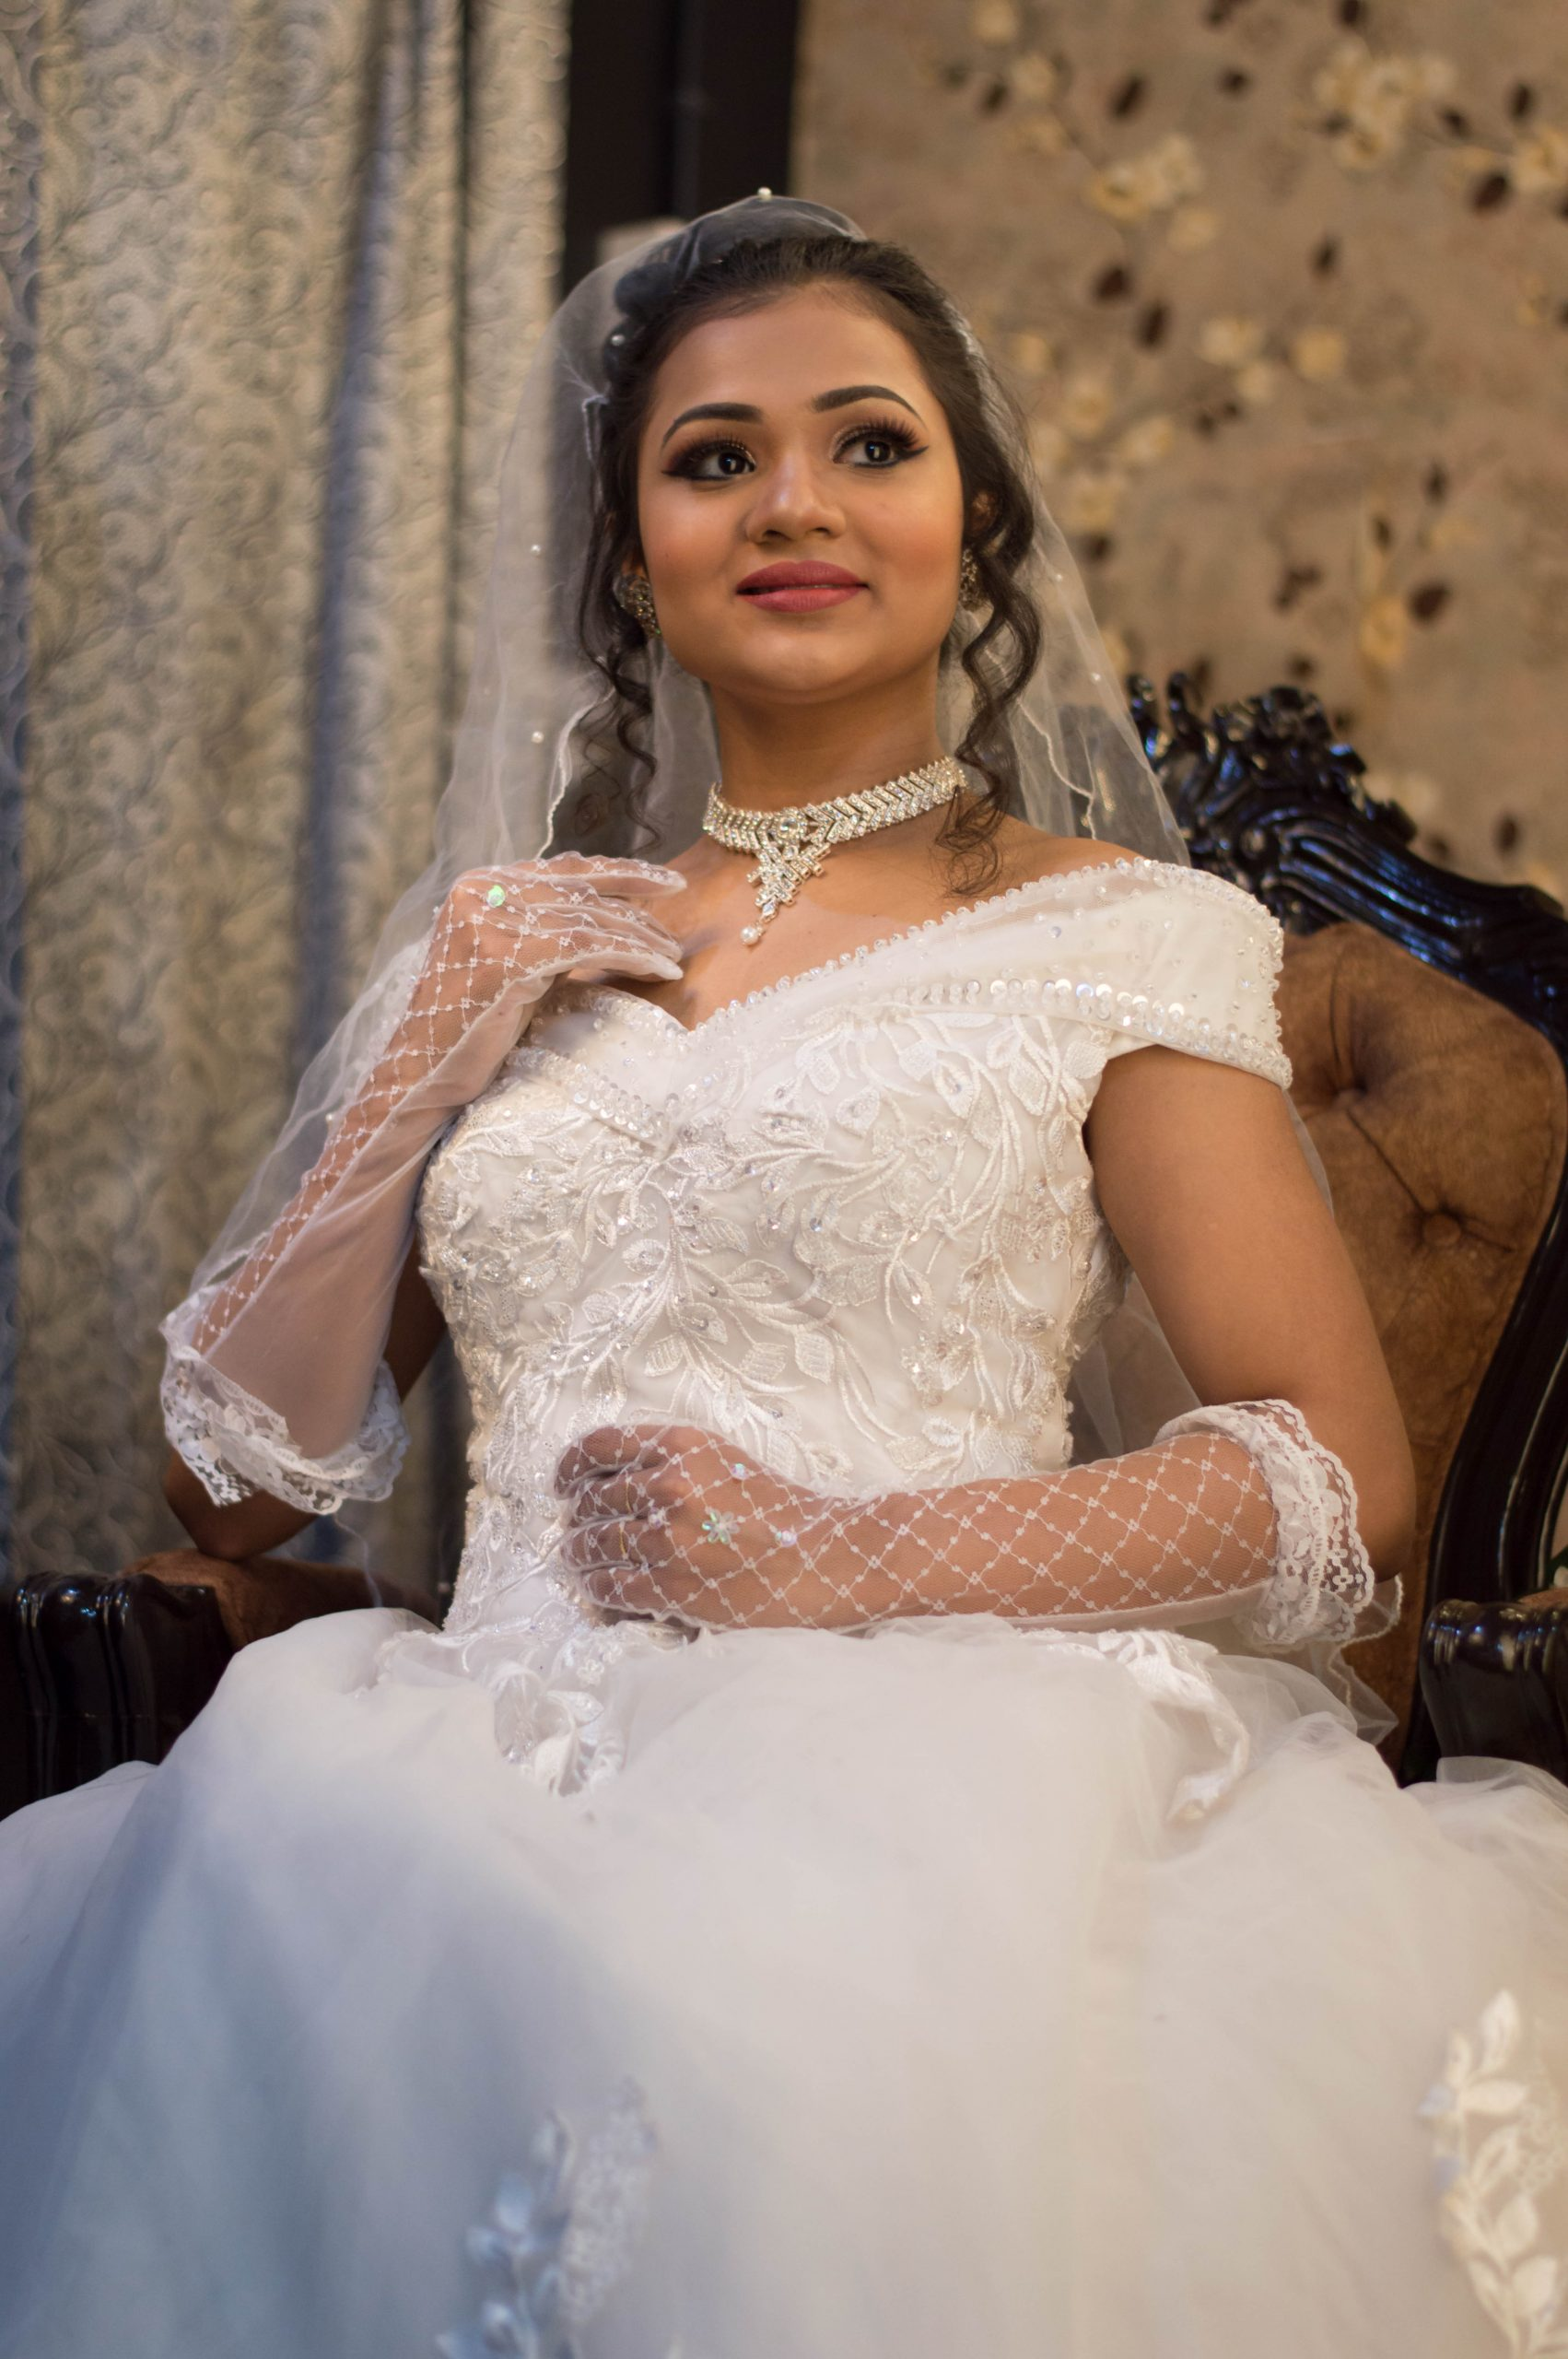 A Christian bride